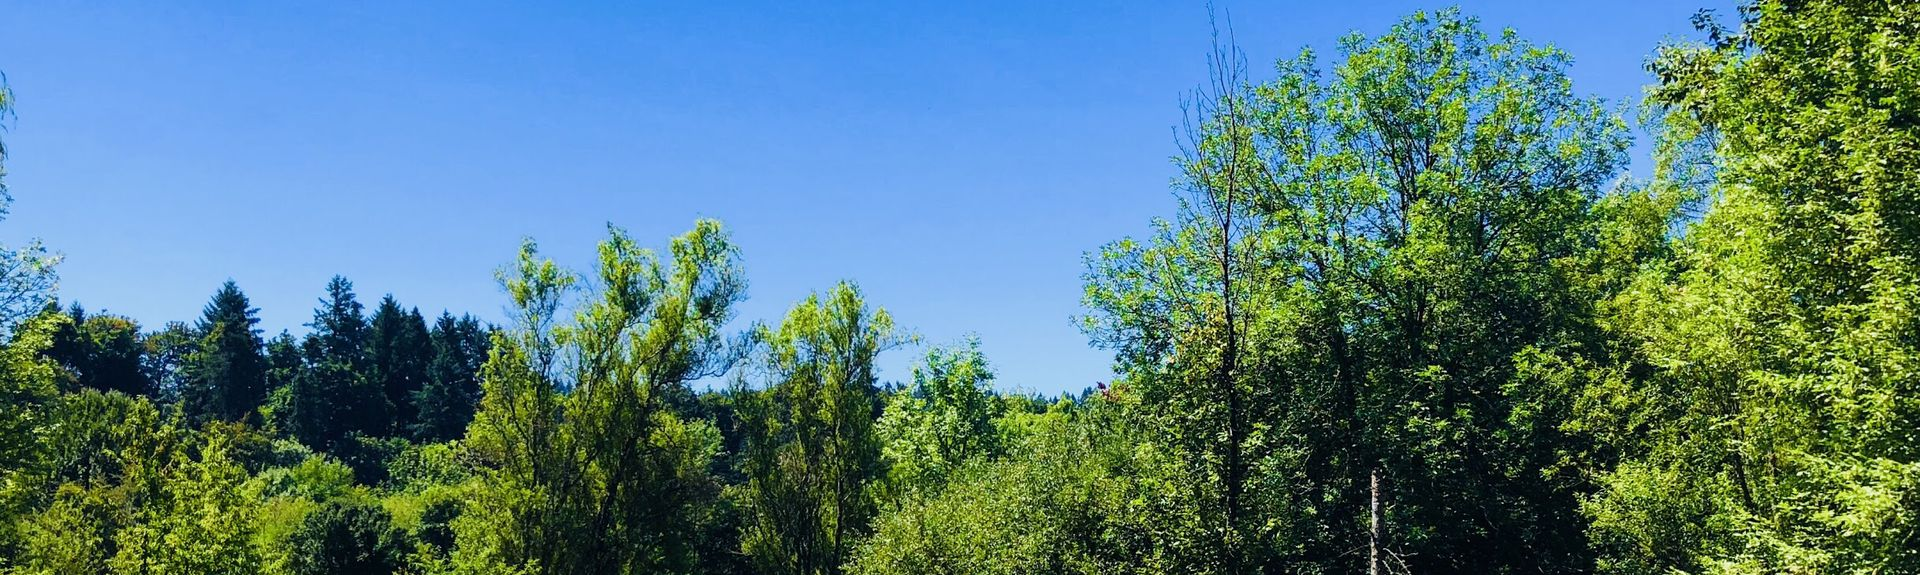 Champoeg State Park, Newberg, OR, USA